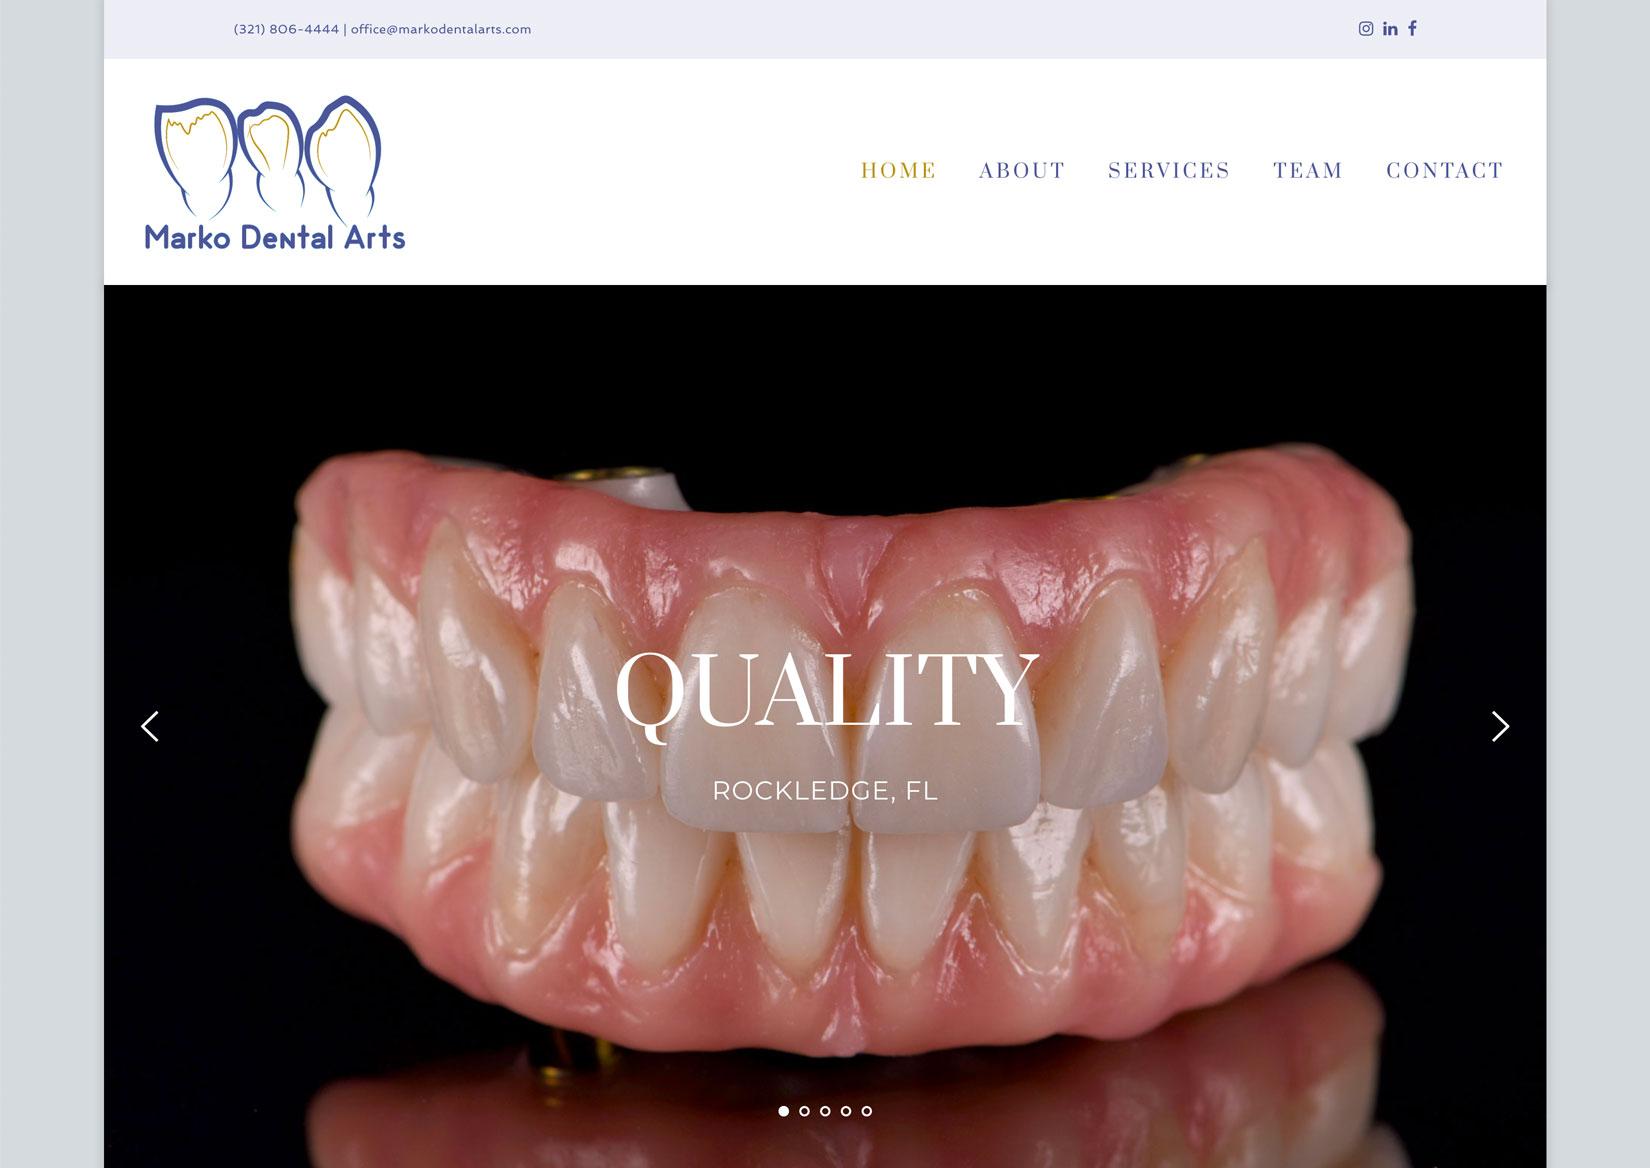 Website Launched: Marko Dental Arts